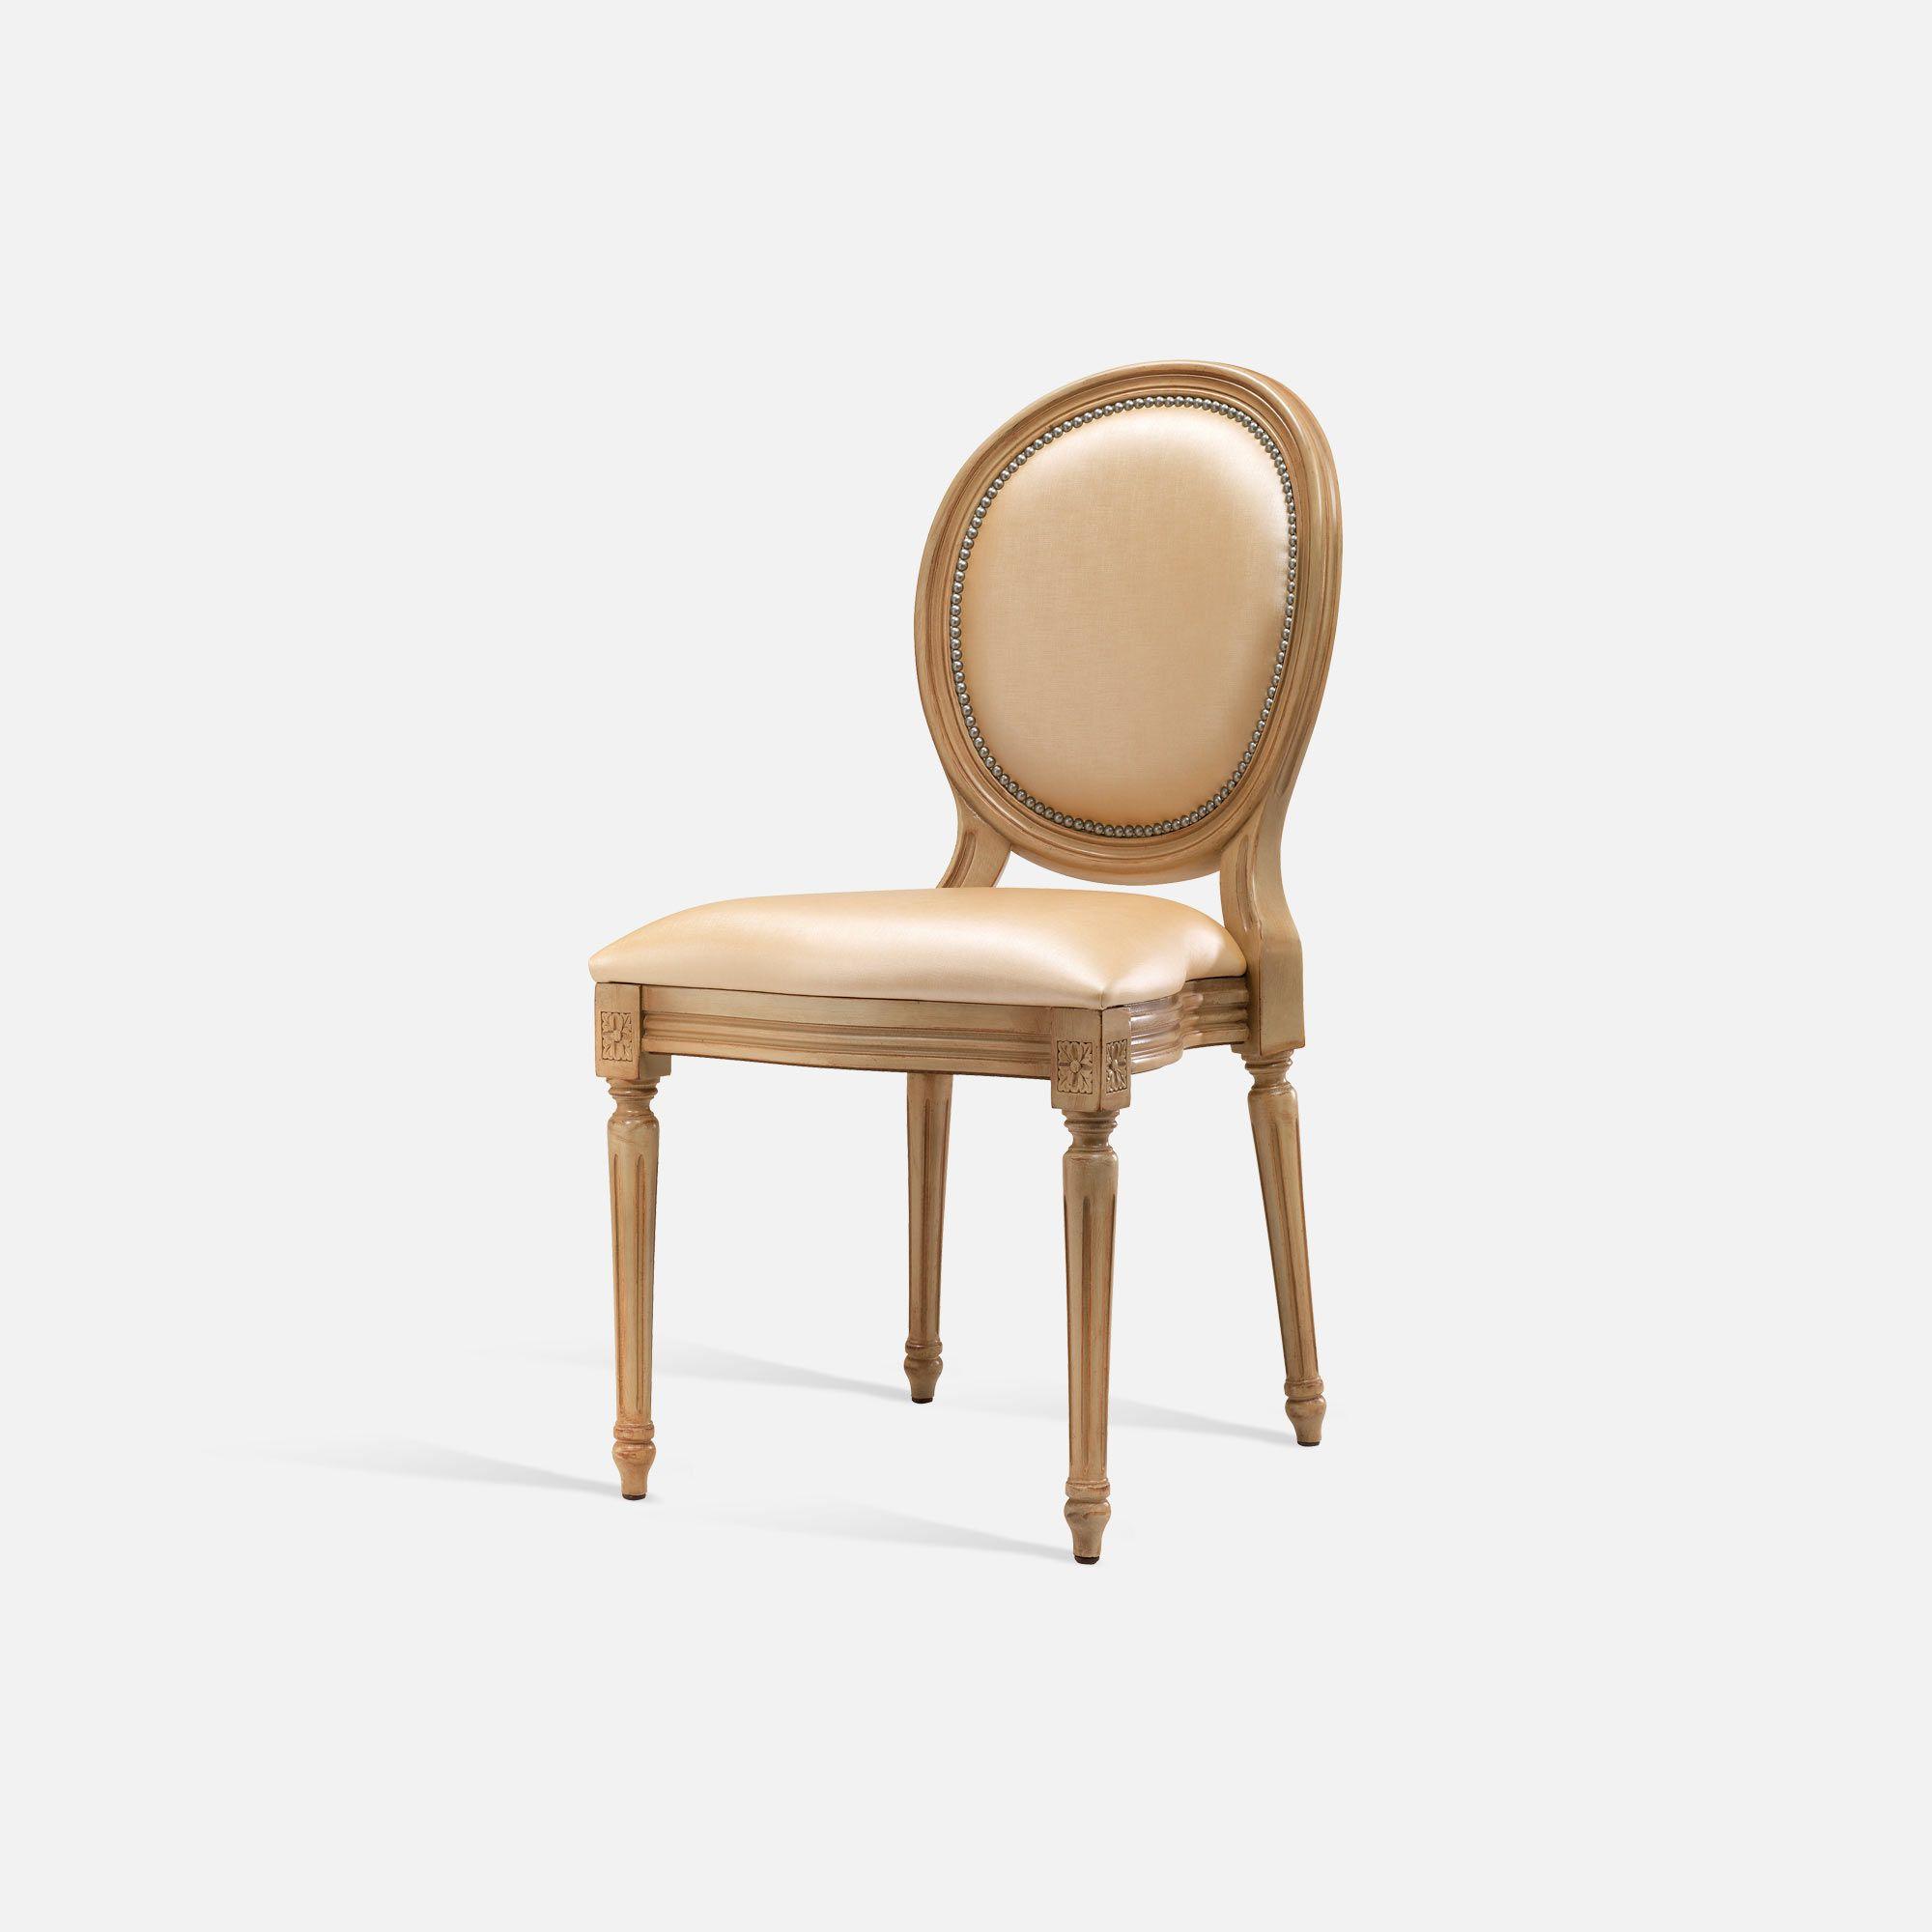 Stackable medallion chair for hotel restaurant bar for Chaise medaillon louis xvi